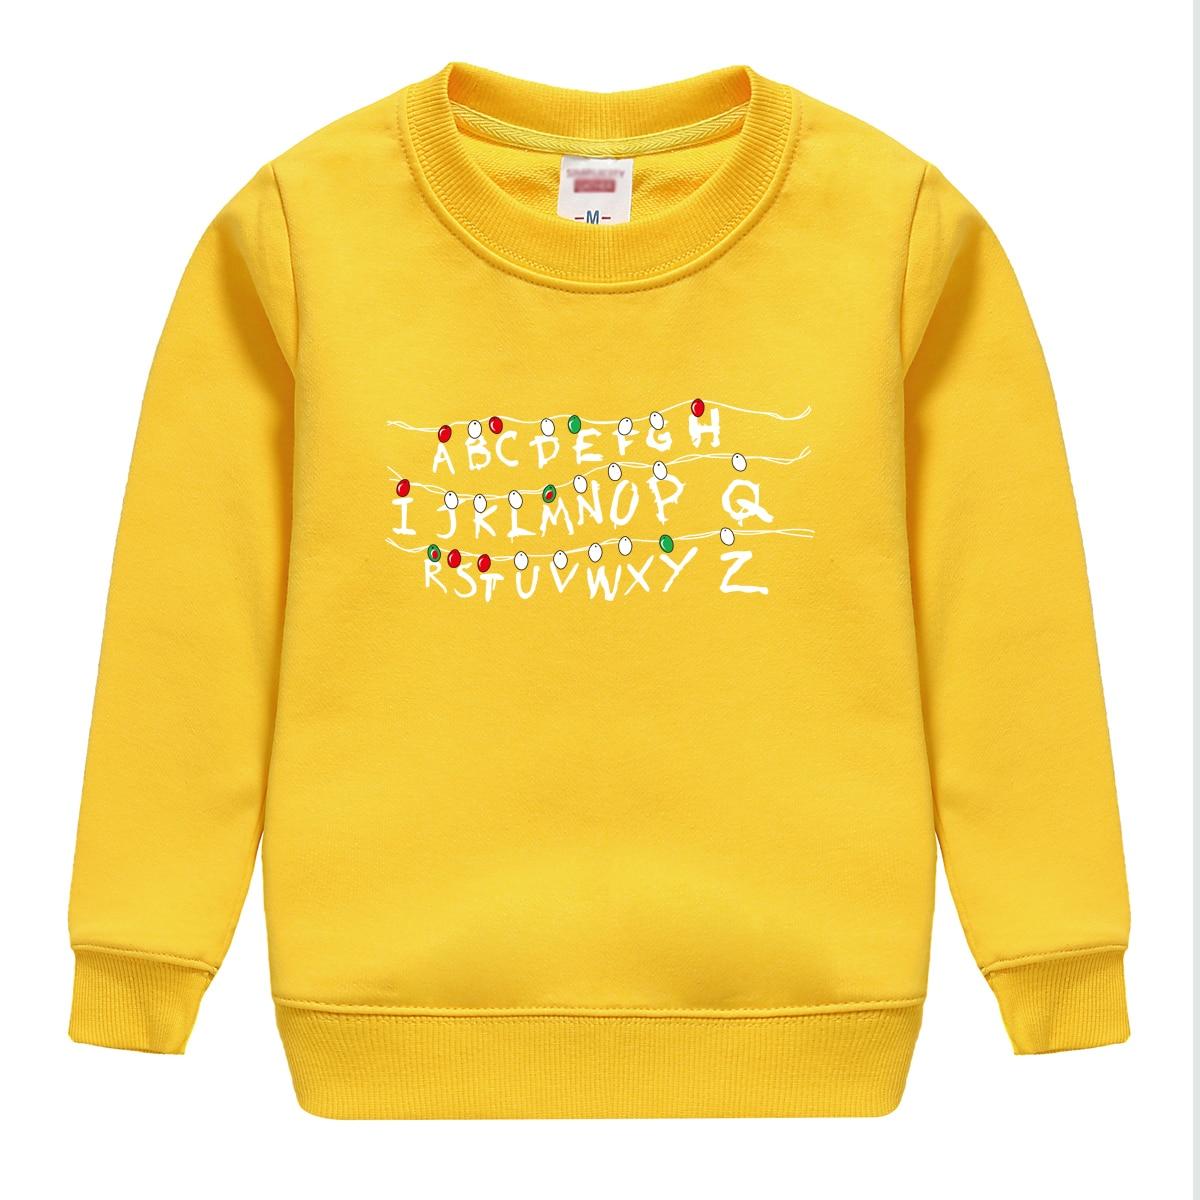 2018 hot sale STRANGE THINGS pattern printed spring autumn cotton sweatshirt baby boy hoodie clothing top soft pullover hip hop